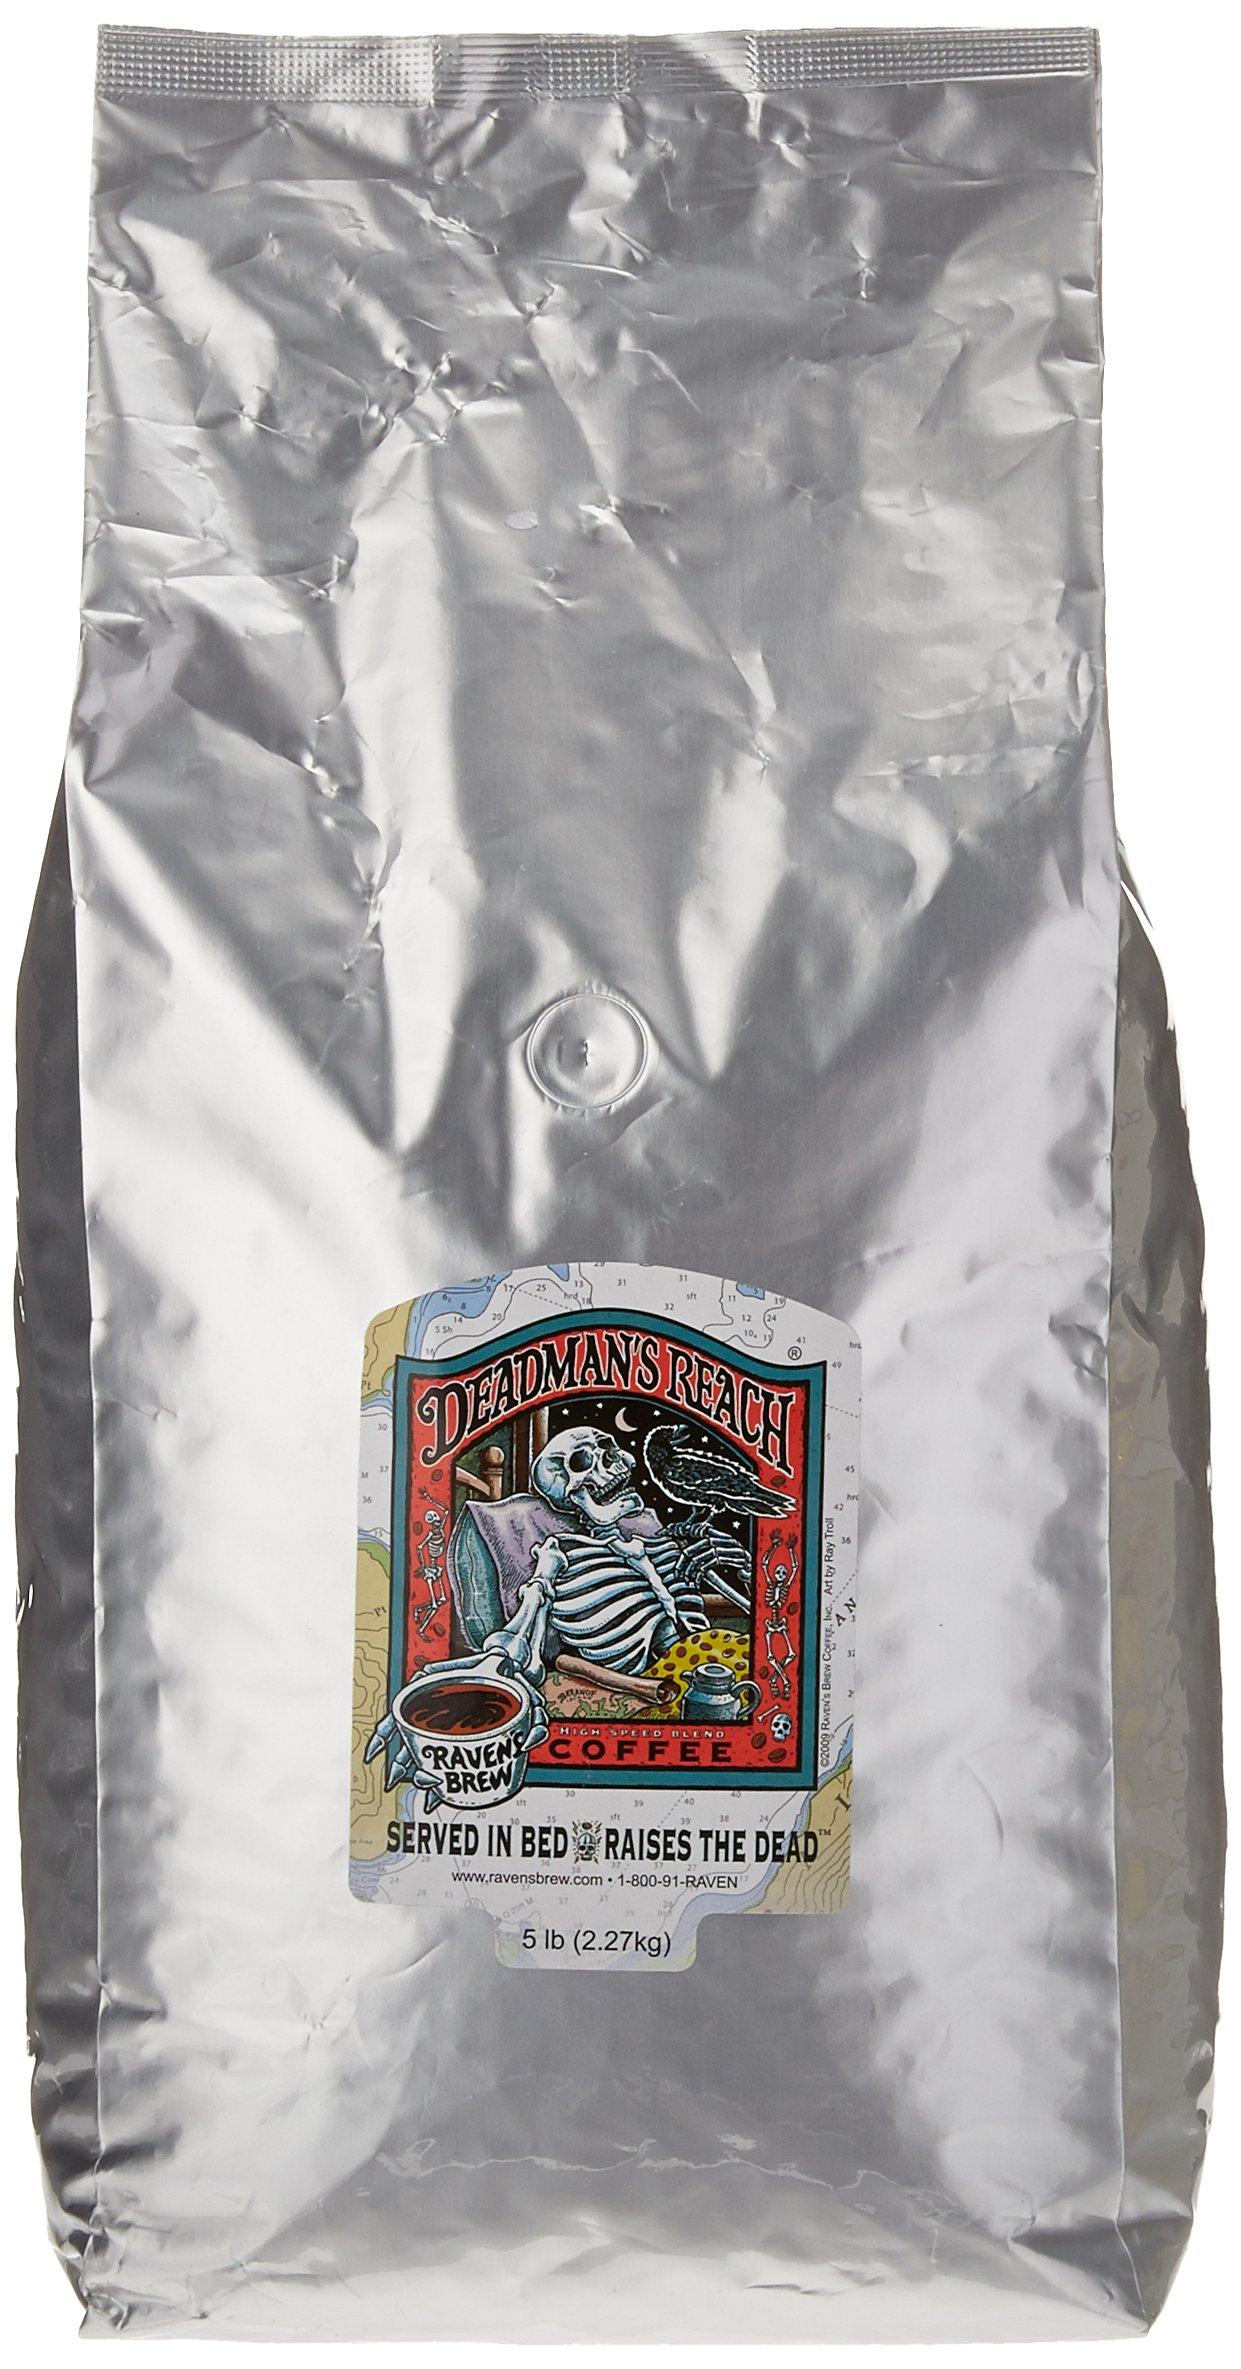 Ravens Brew Whole Bean Deadman's Reach, Dark Roast 5-Pound Bag by Raven's Brew Coffee